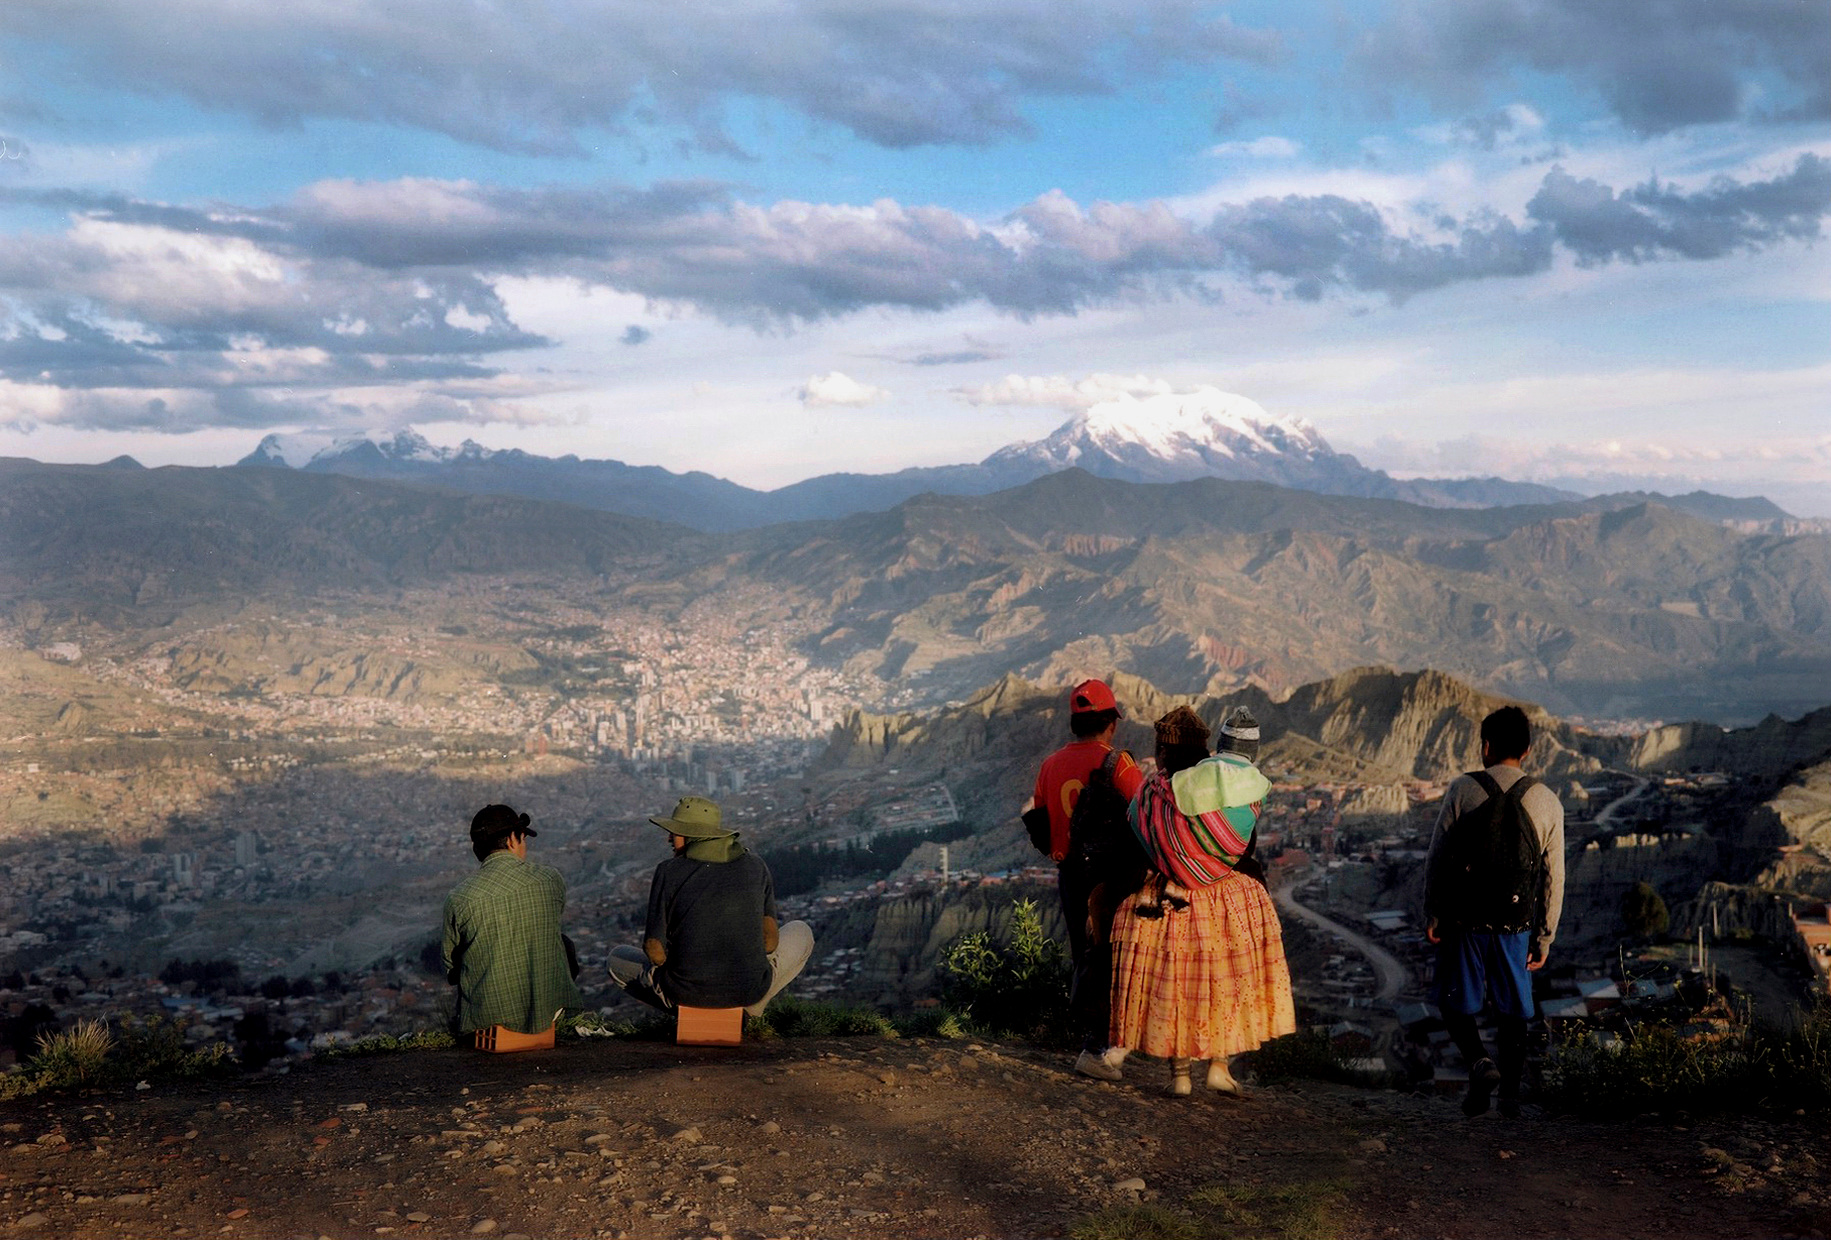 El Alto, looking at La Paz, Bolivia